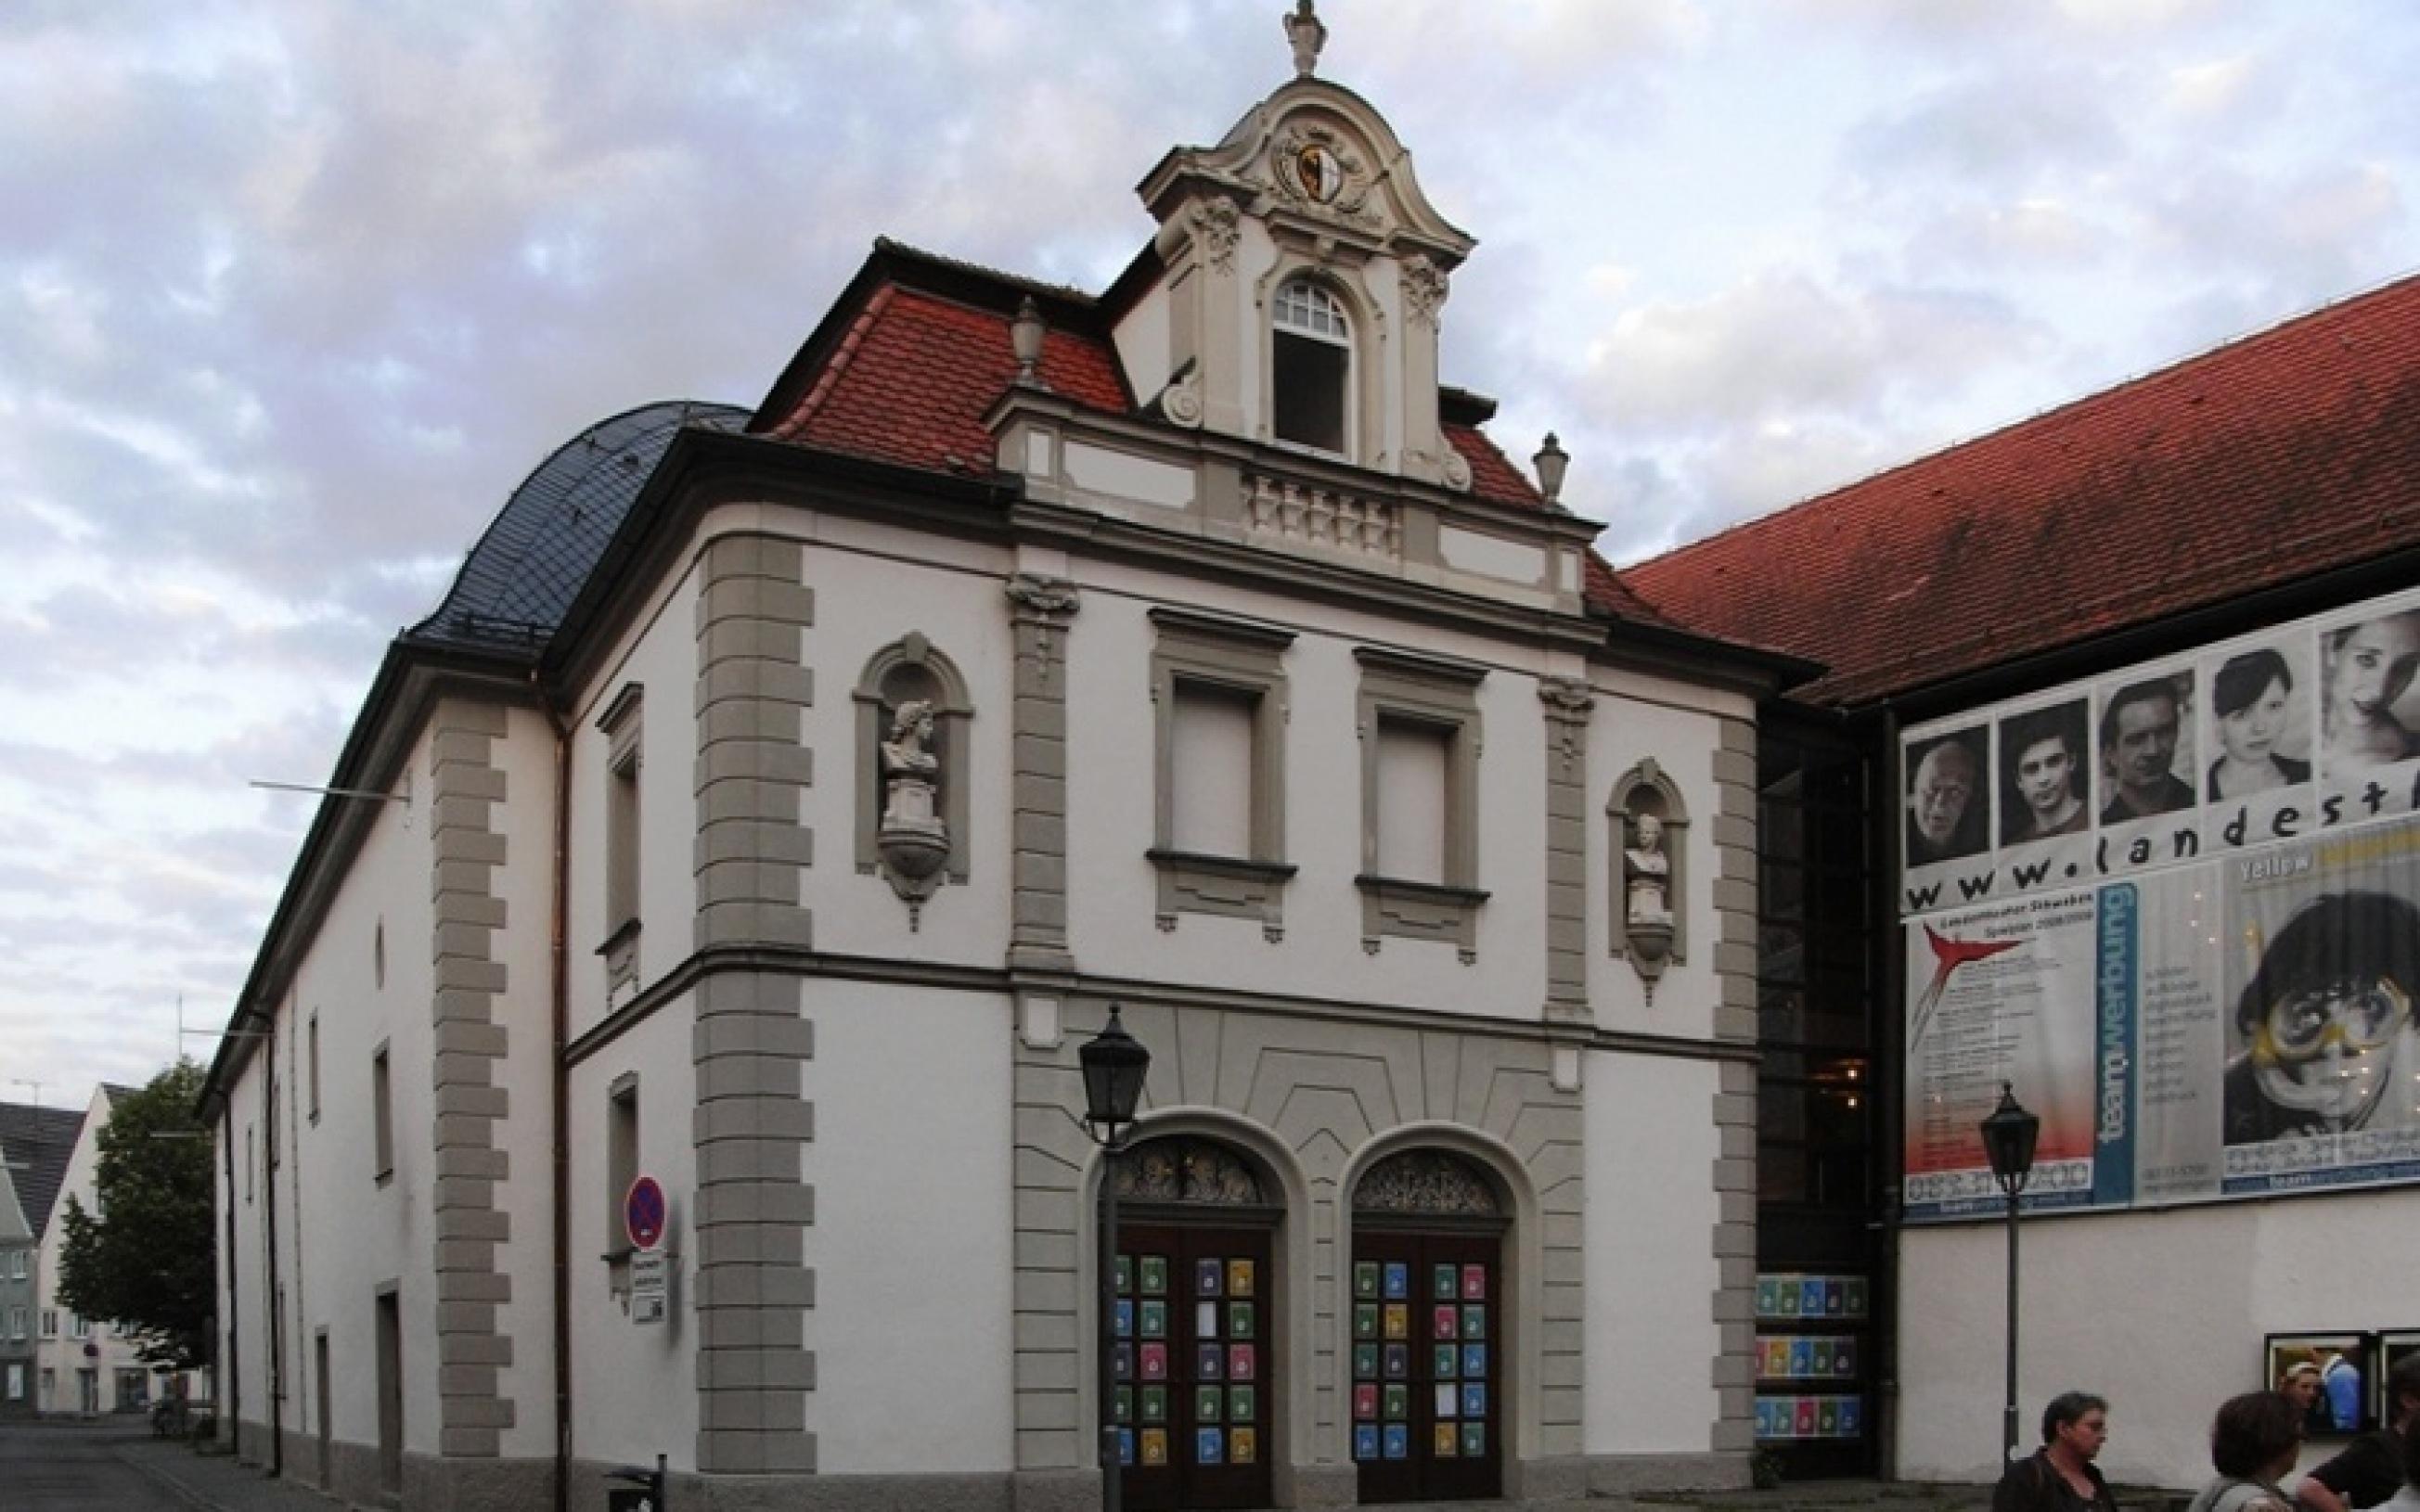 Stadttheater in Memmingen, Hauptsitz des Landestheaters Schwaben